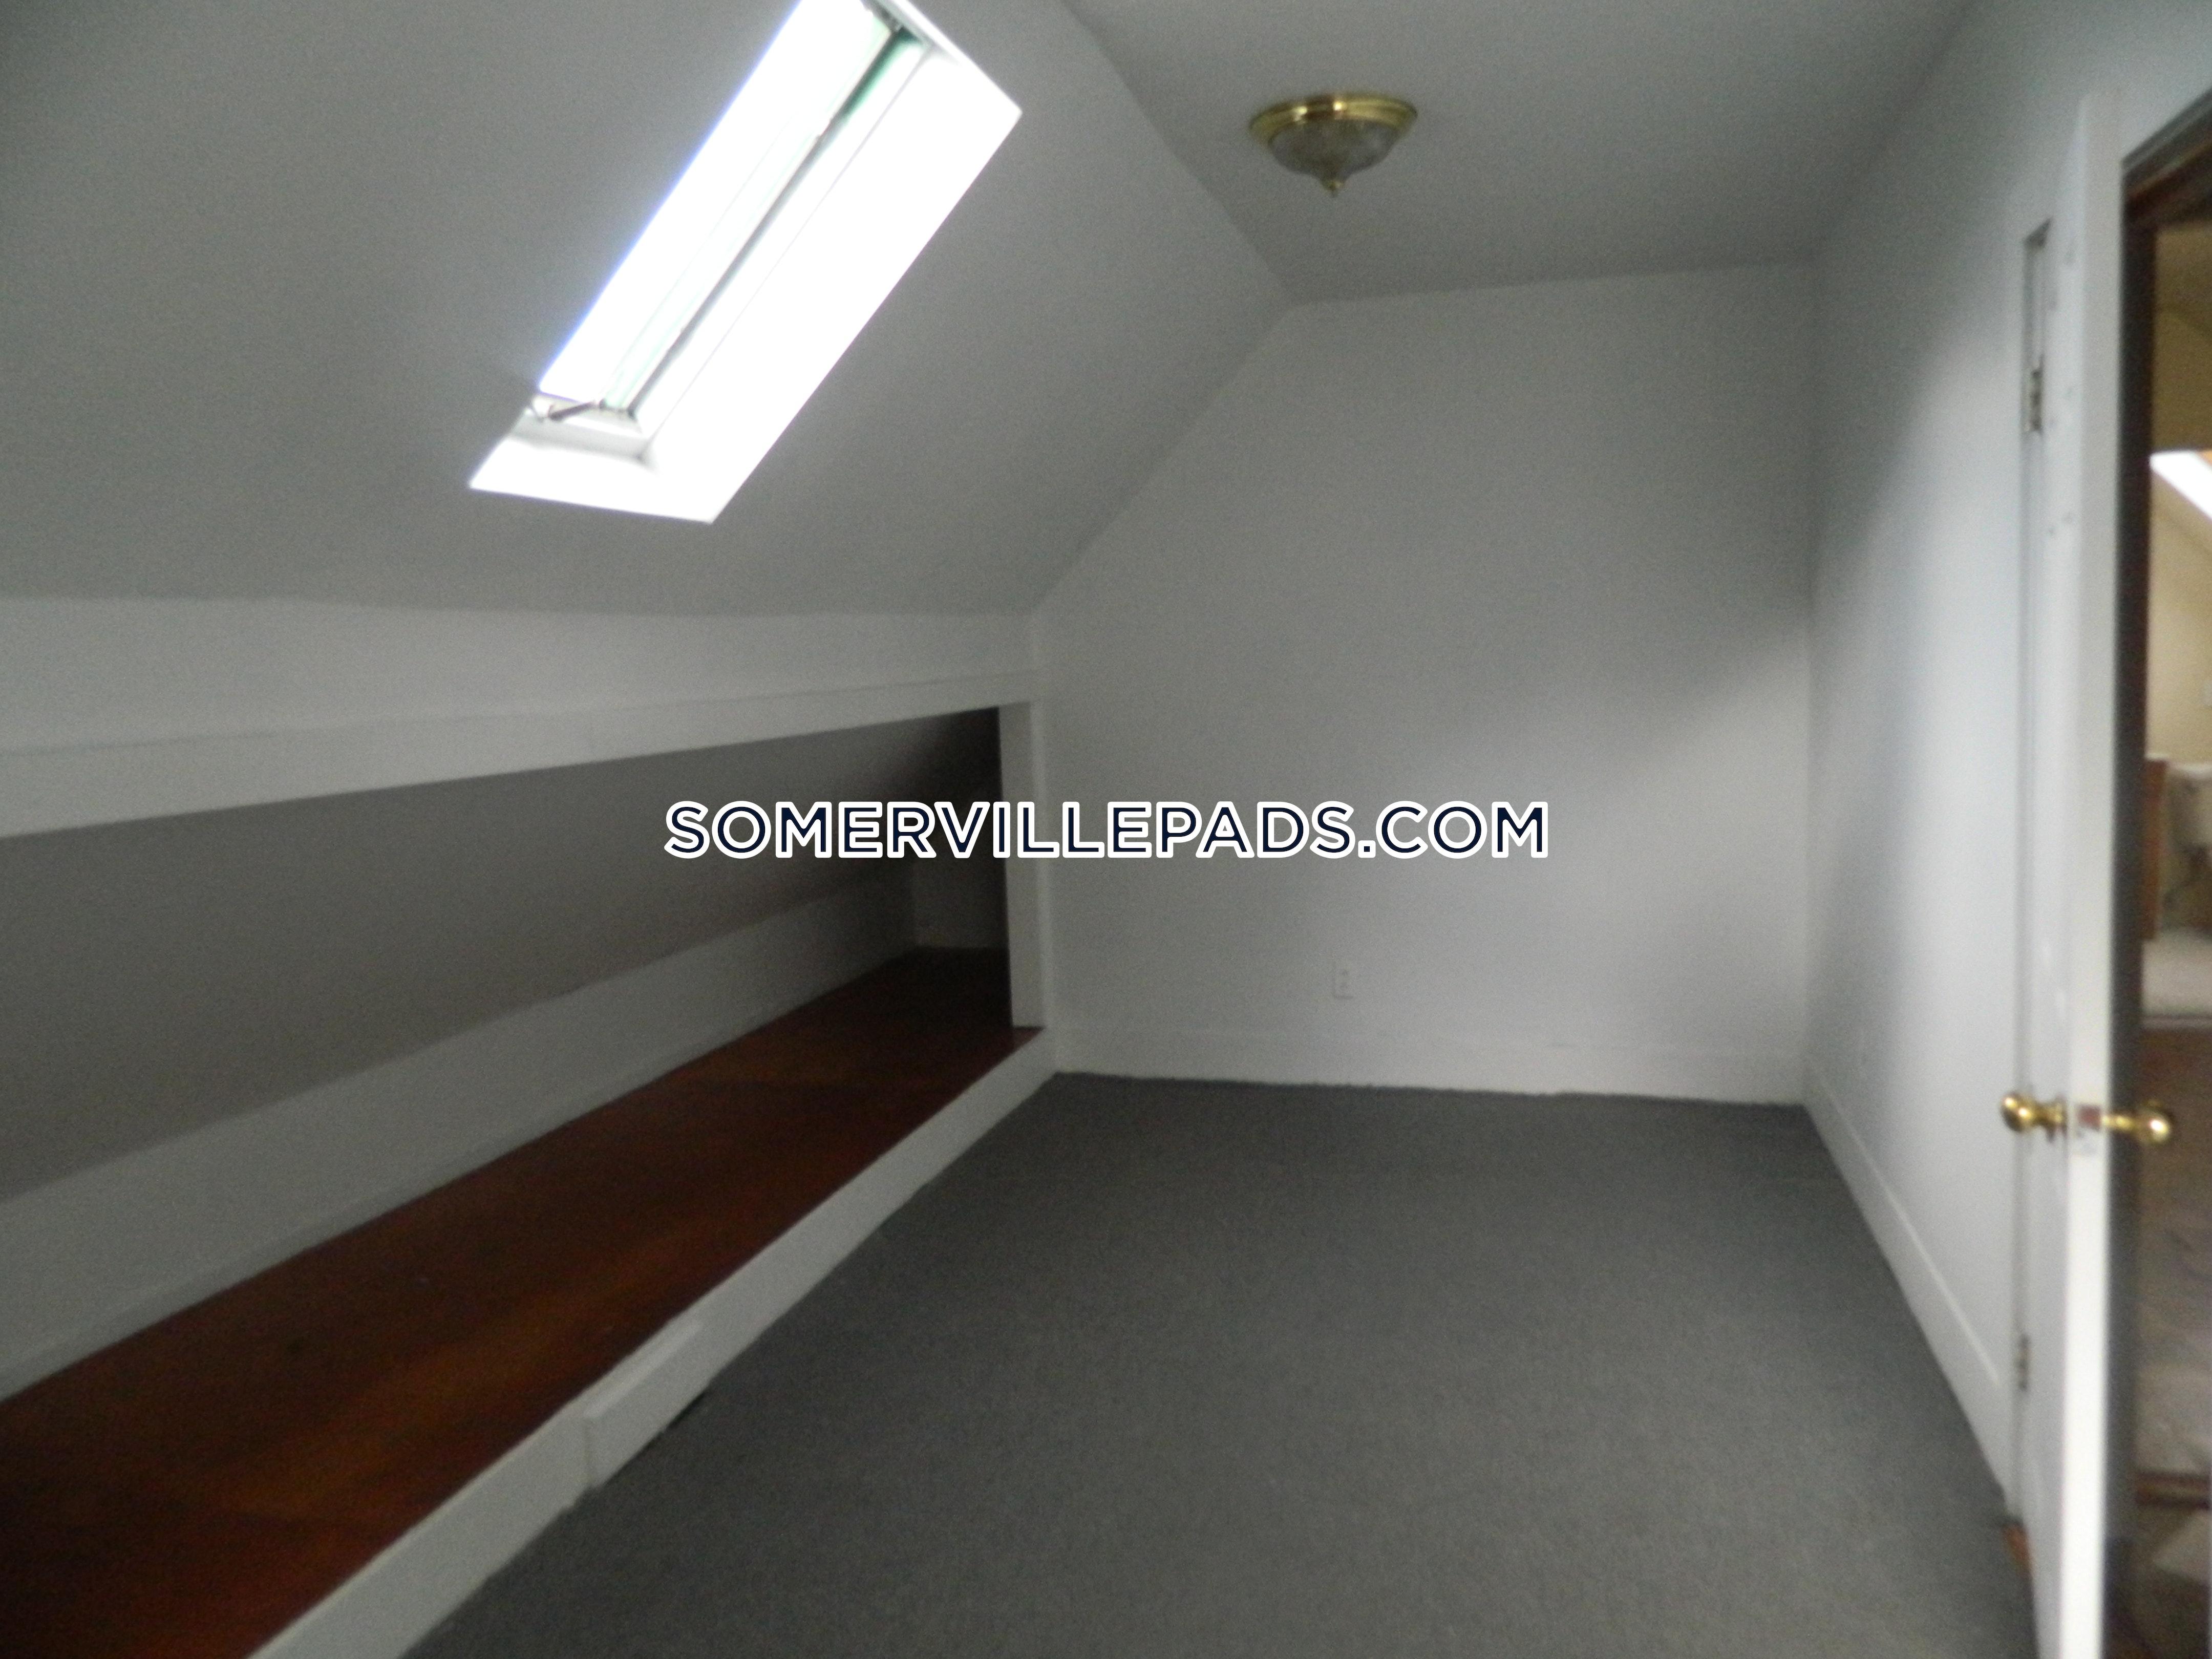 6-beds-2-baths-somerville-spring-hill-4500-428958